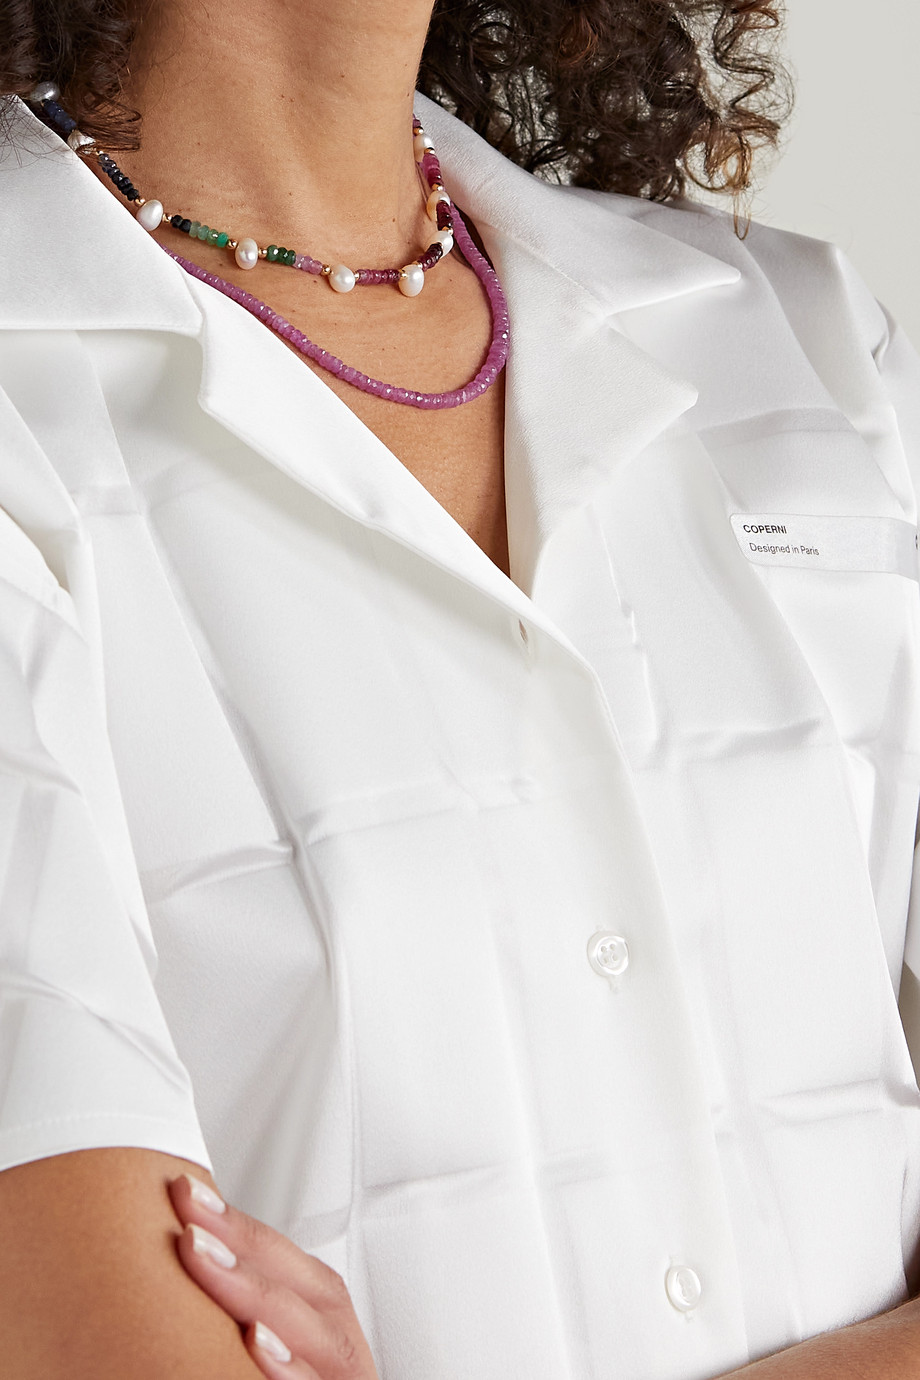 JIA JIA Arizona gold, sapphire and pearl necklace